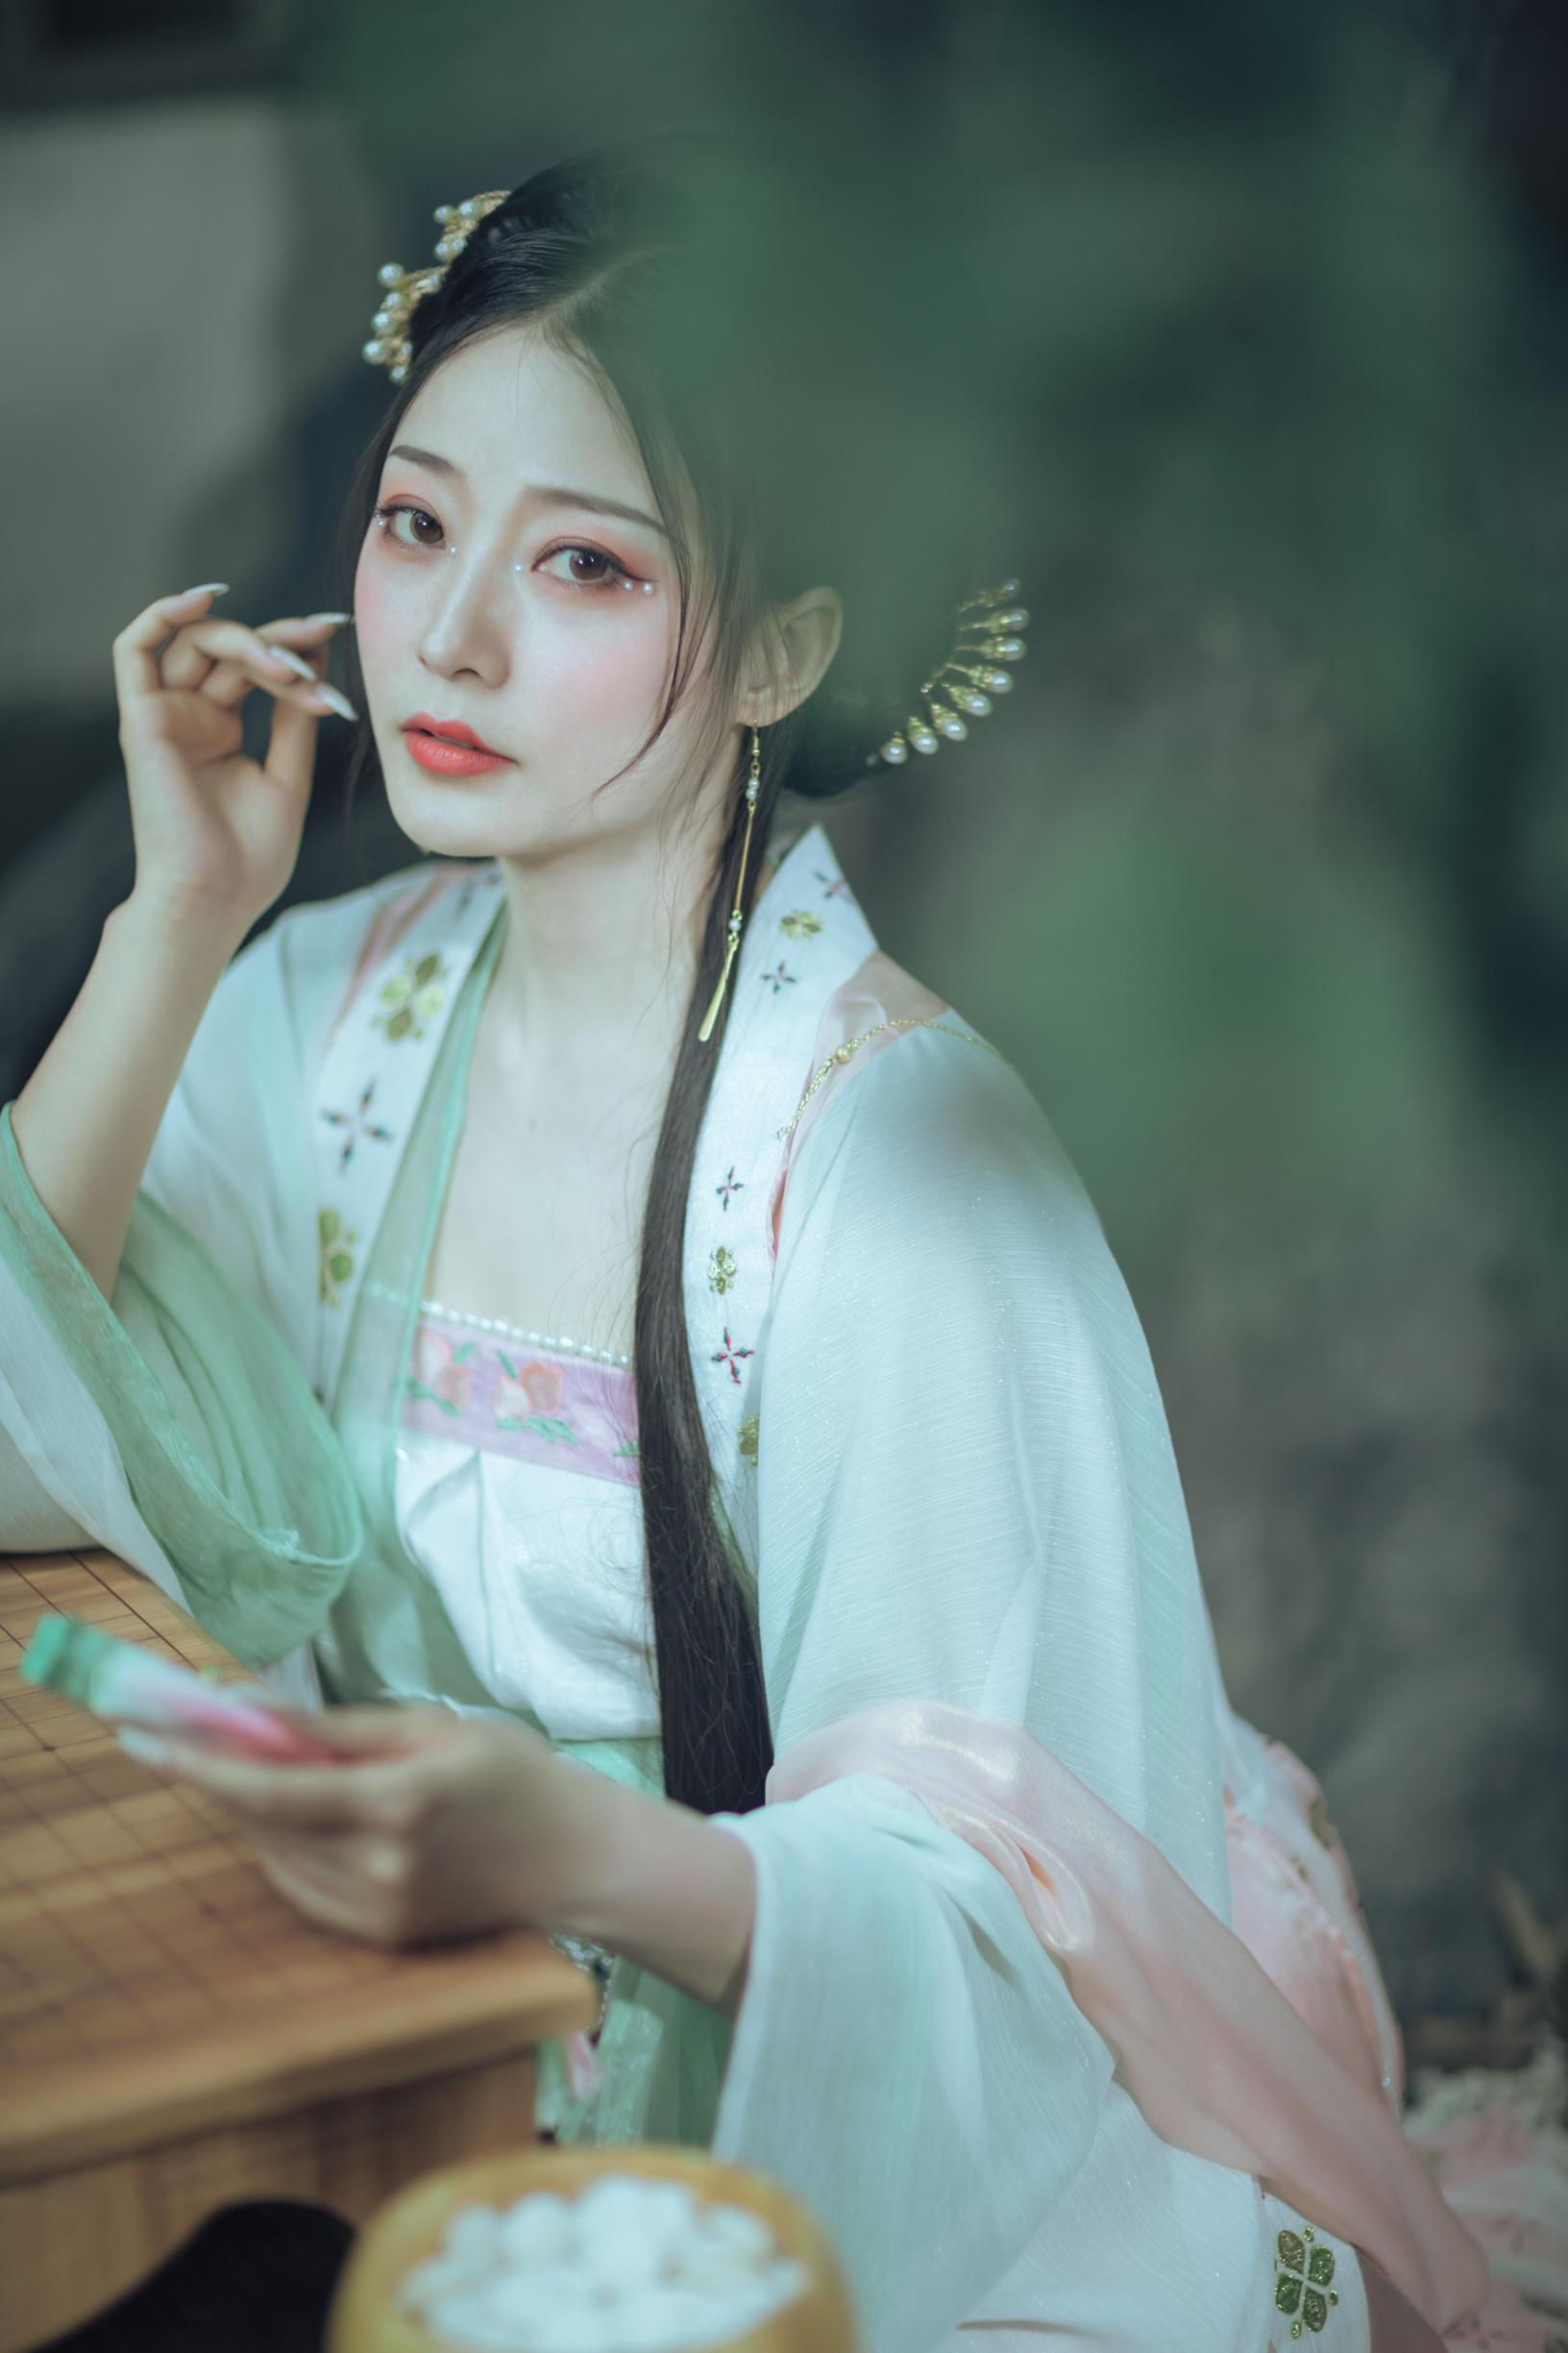 《天涯明月刀OL》古风cosplay【CN:coser小龙女】 -cosplaybabes图片插图